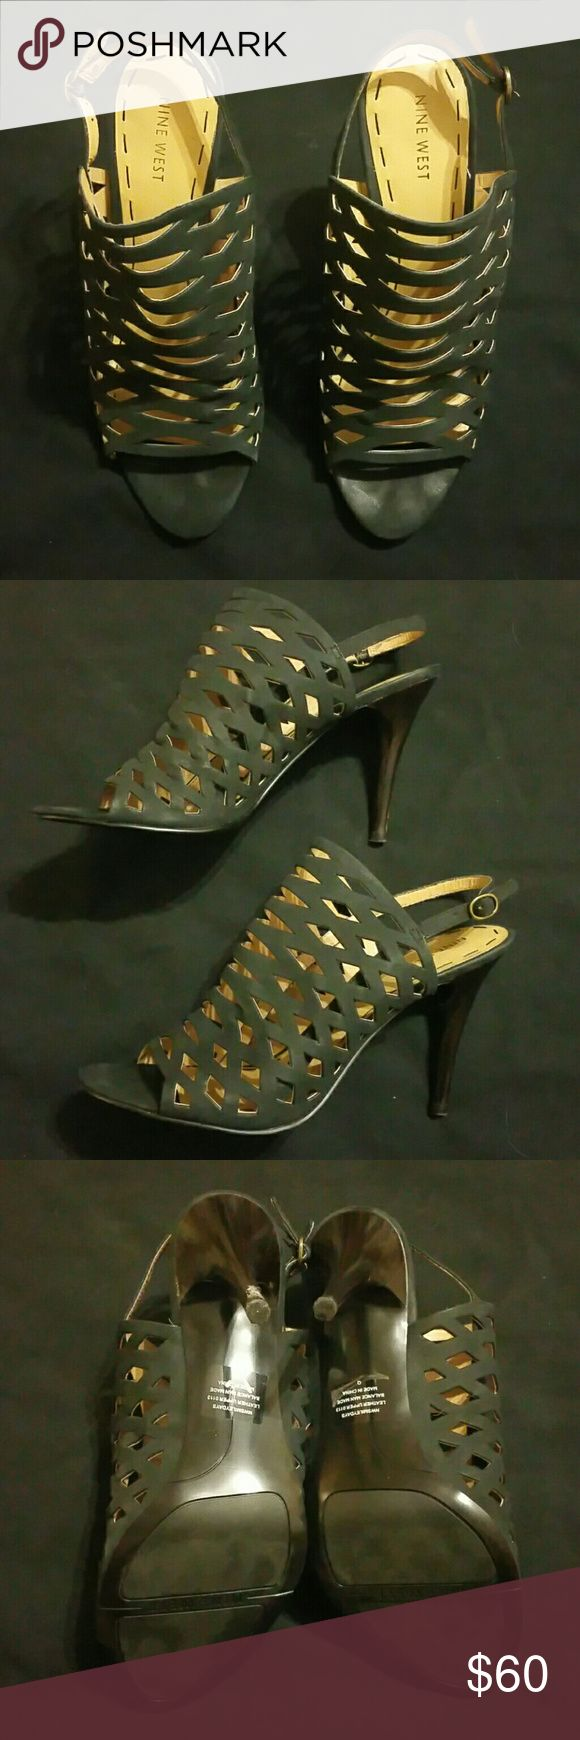 Nine West heeled leather sandals Black leather nine west heeled sandals. New in box, never worn Nine West Shoes Heels